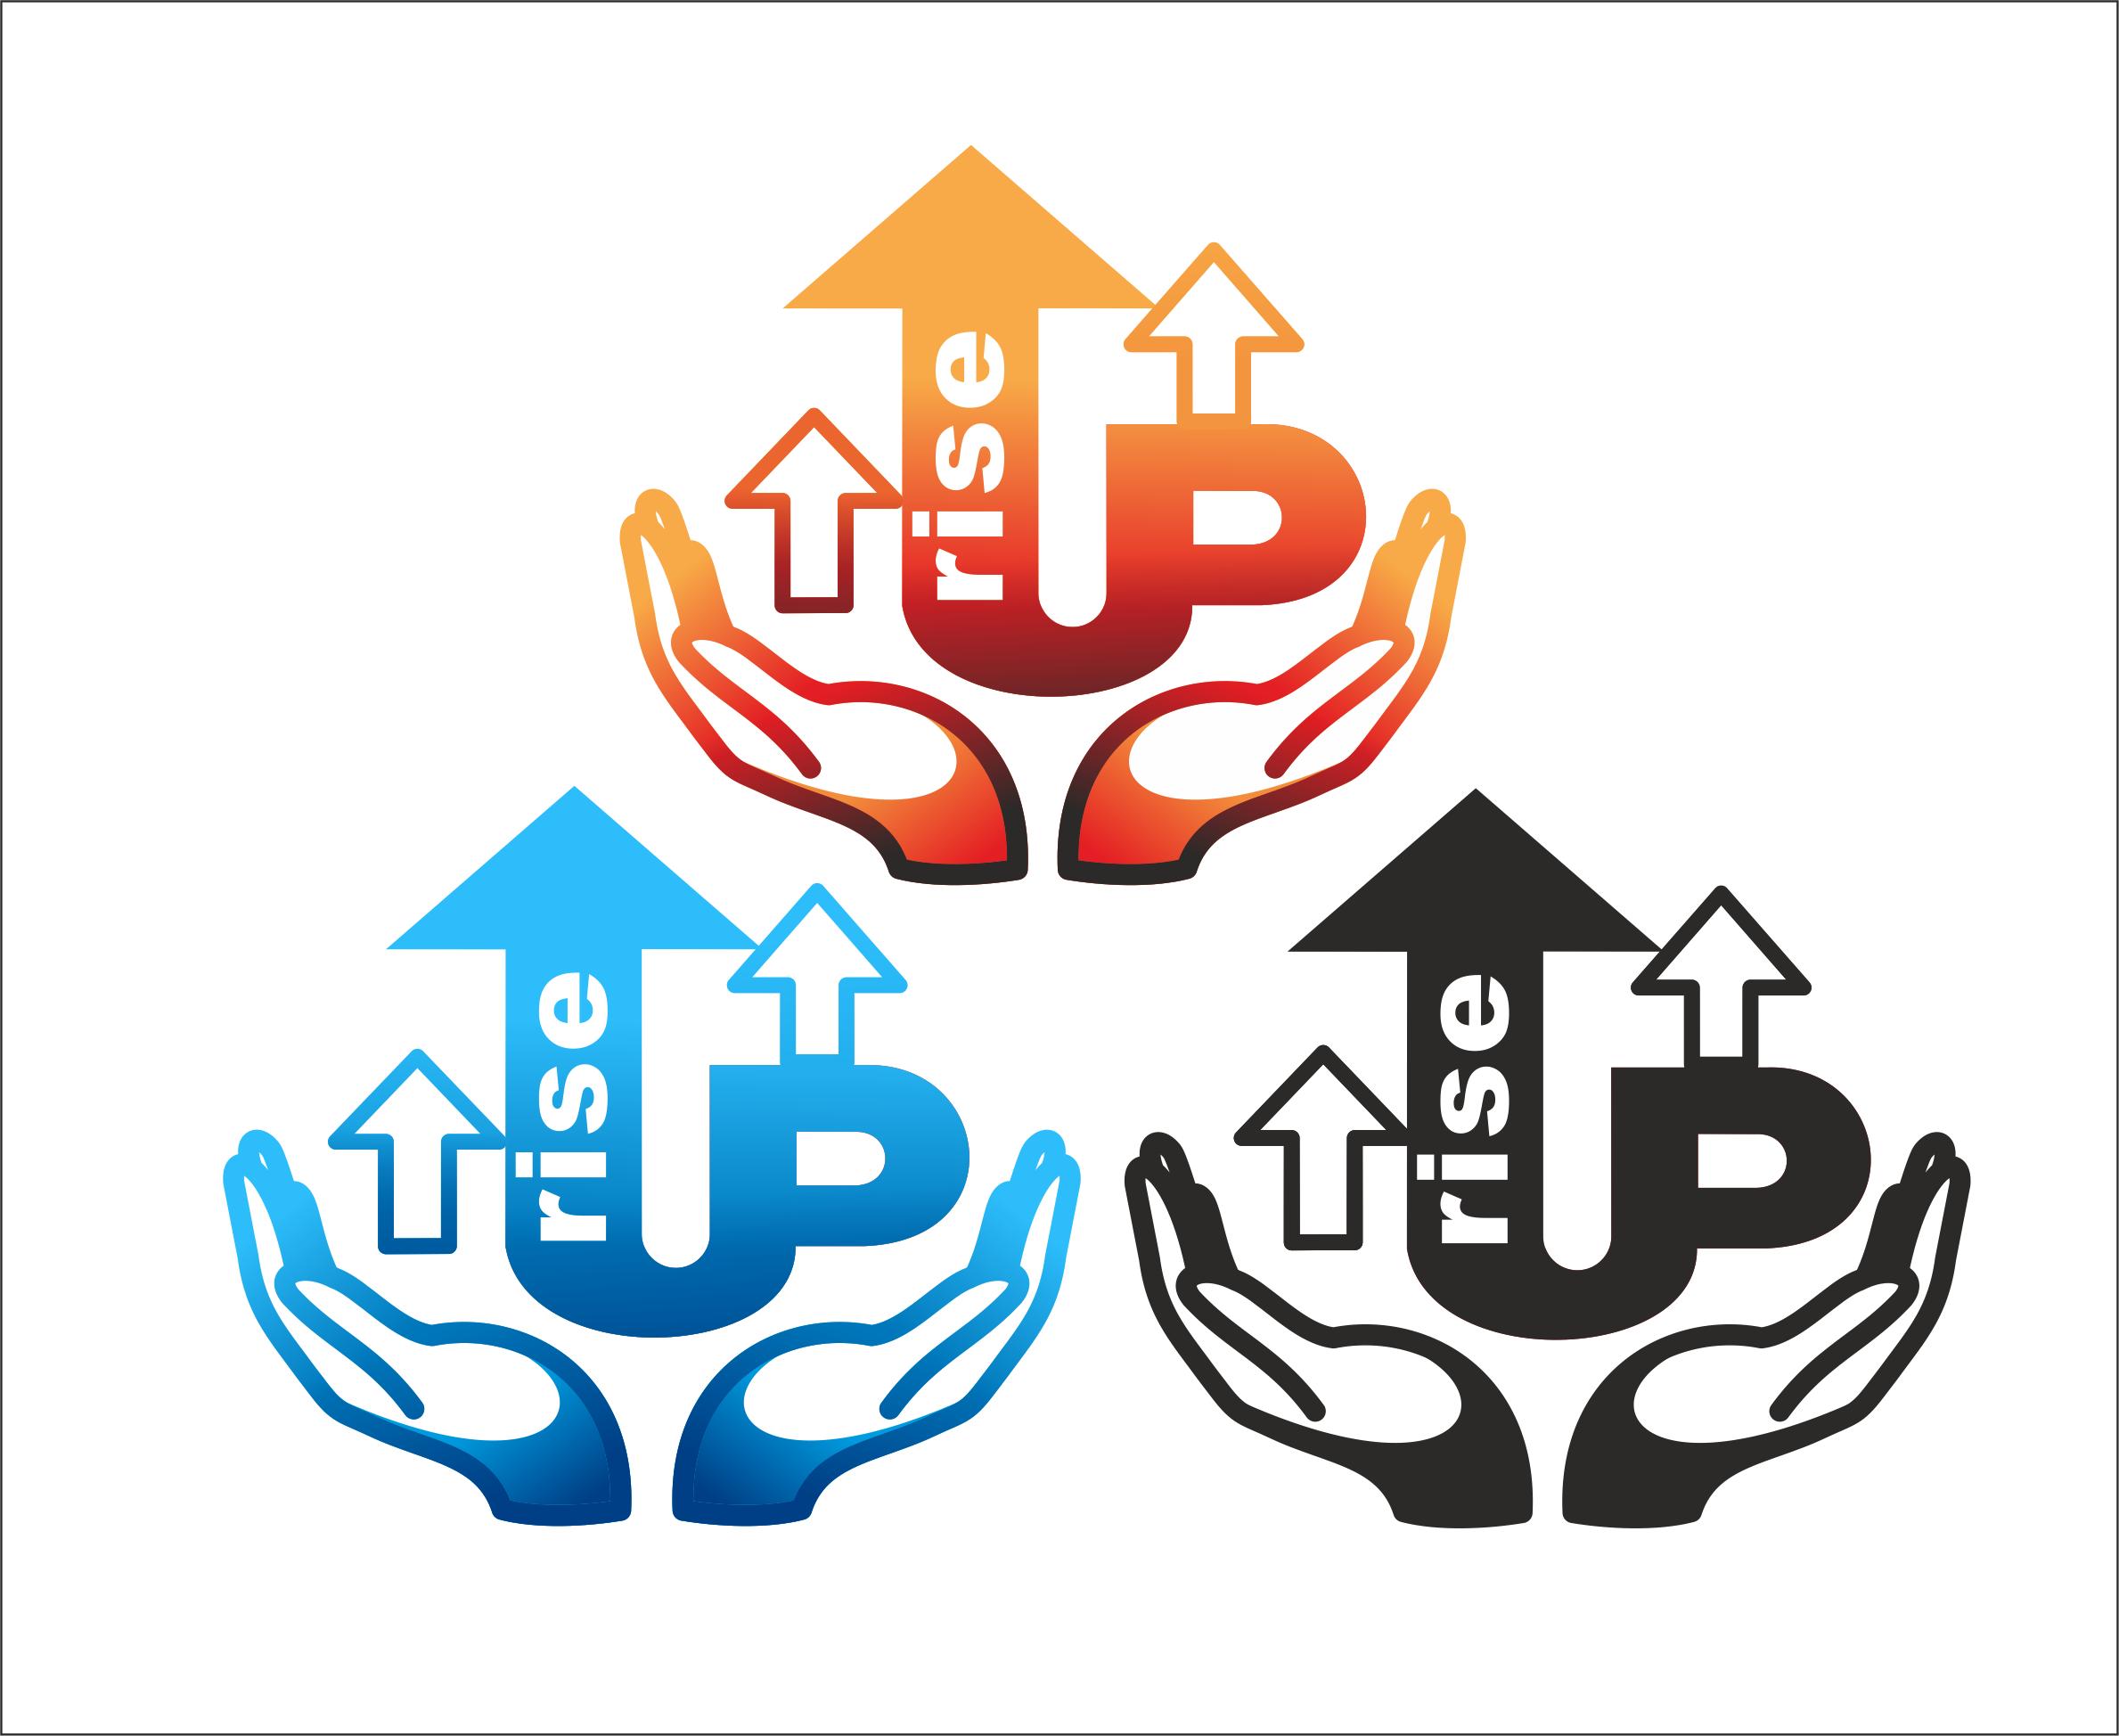 Разработать логотип + визитку + логотип для печати ООО +++ фото f_0475554c9d864b53.png